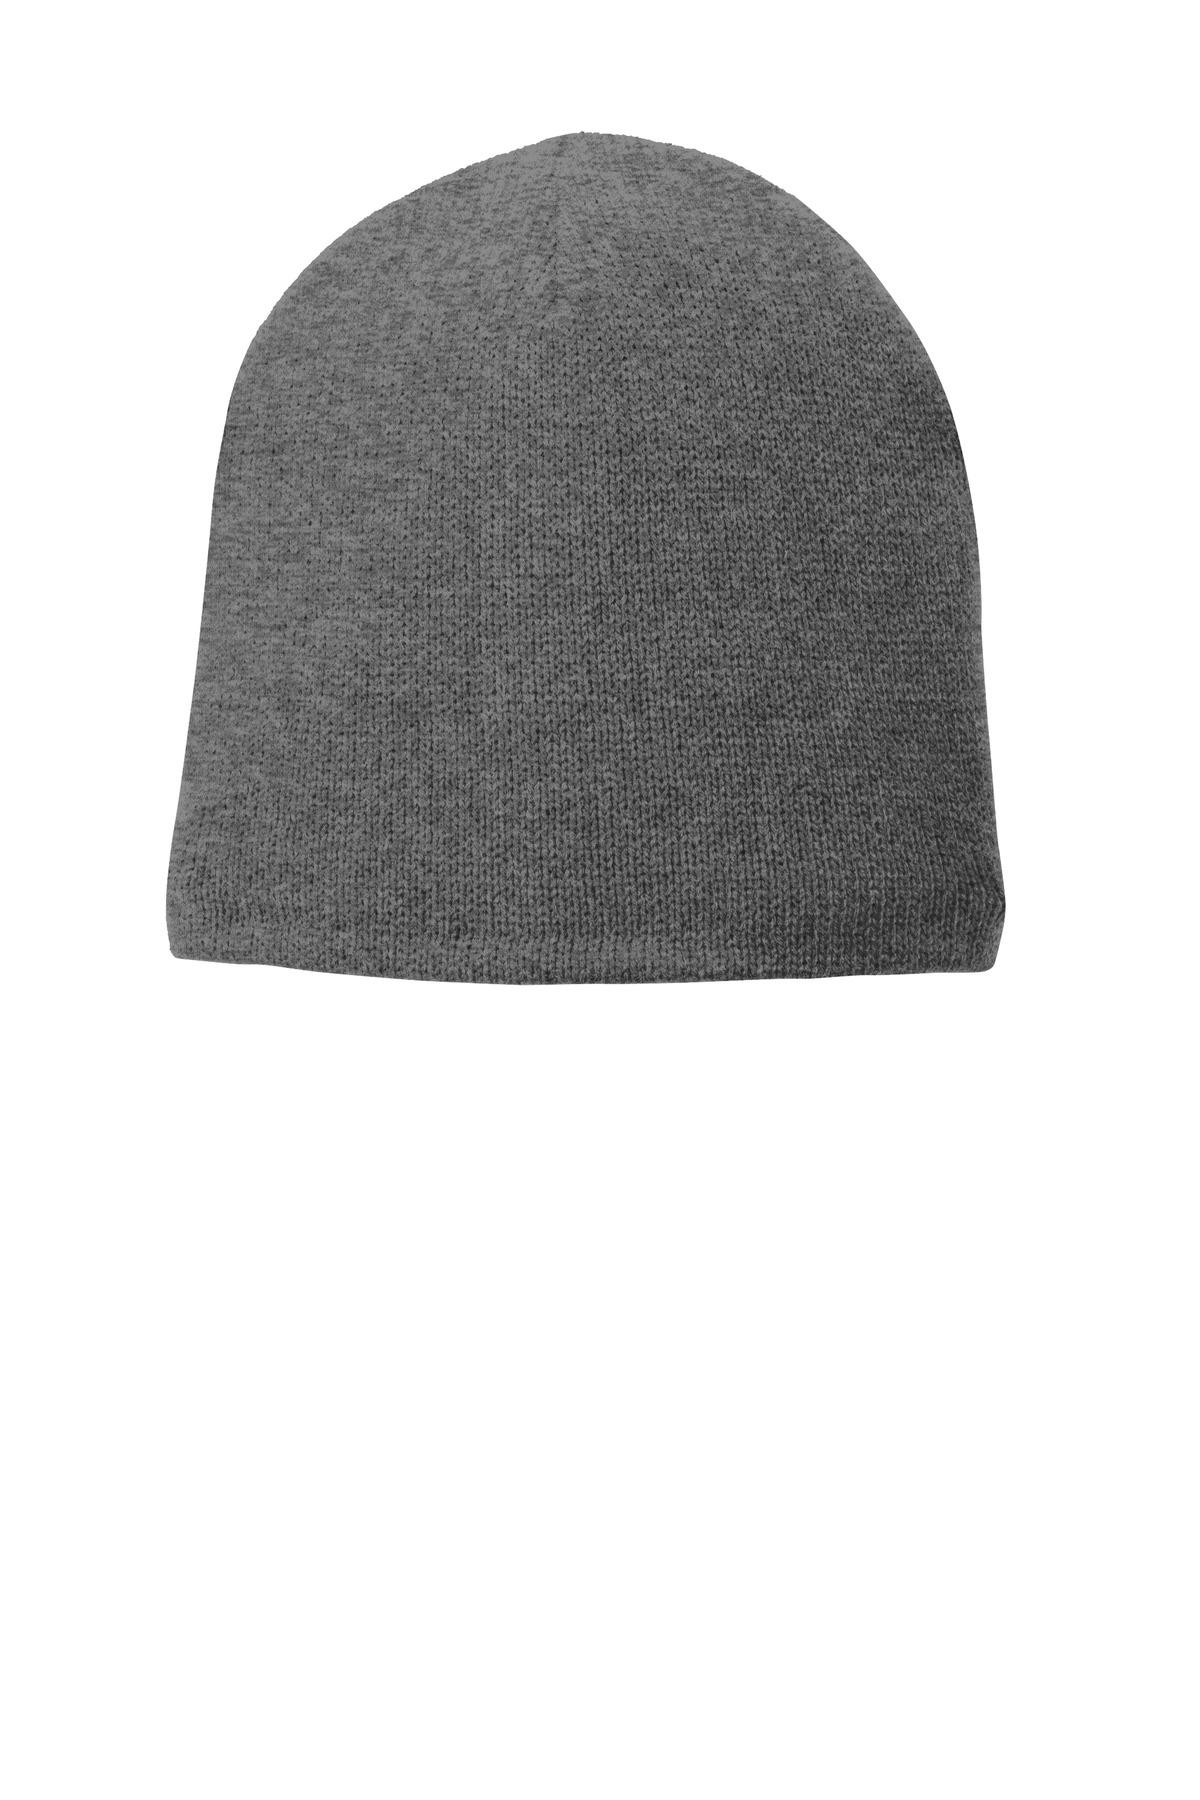 Port & Company  CP91L - Fleece-Lined Beanie Cap